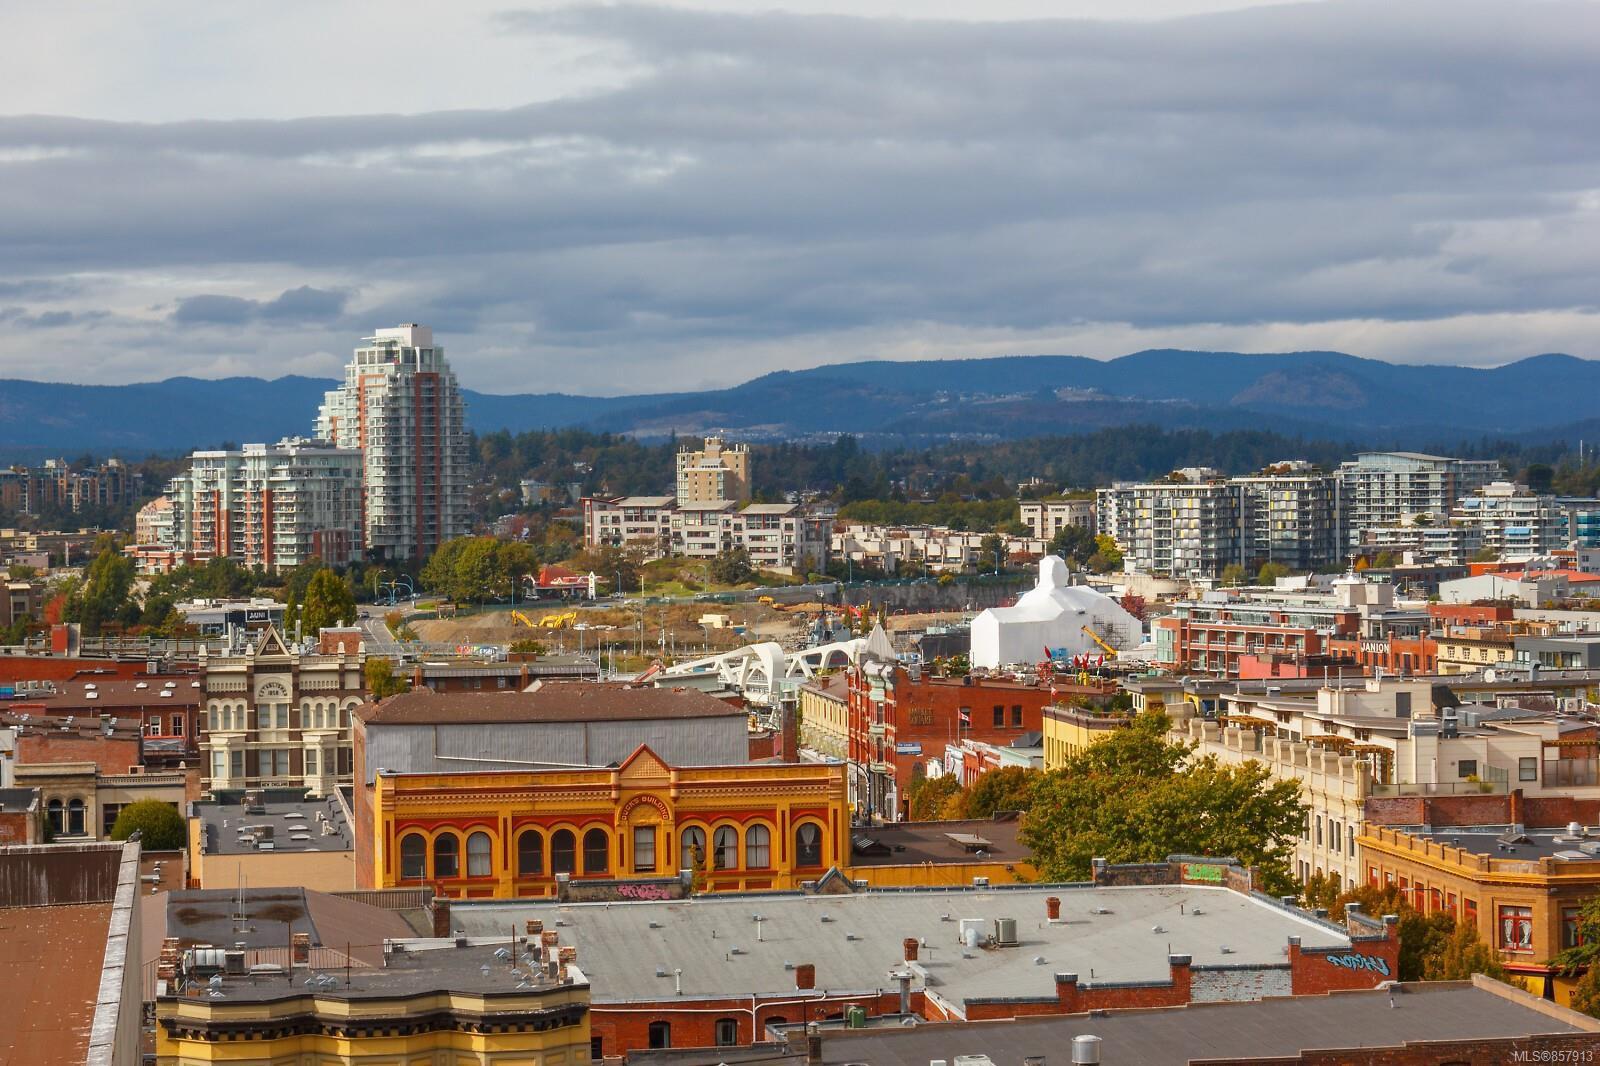 Photo 18: Photos: 1011 728 Yates St in : Vi Downtown Condo for sale (Victoria)  : MLS®# 857913